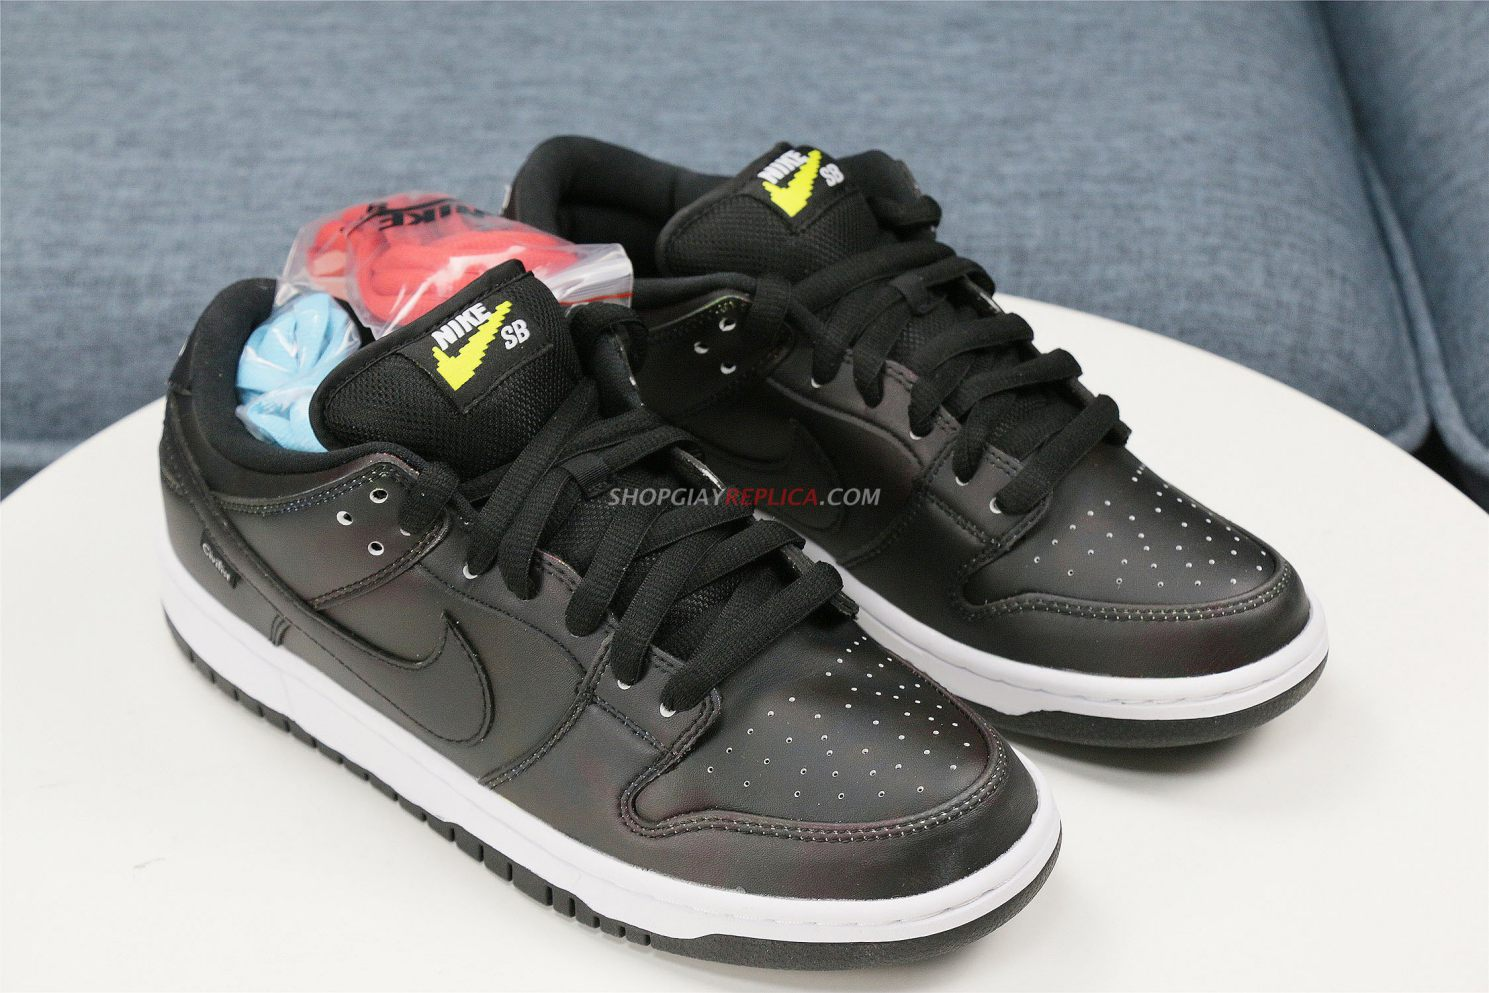 Giày Nike SB Dunk Low Civilist rep 1:1